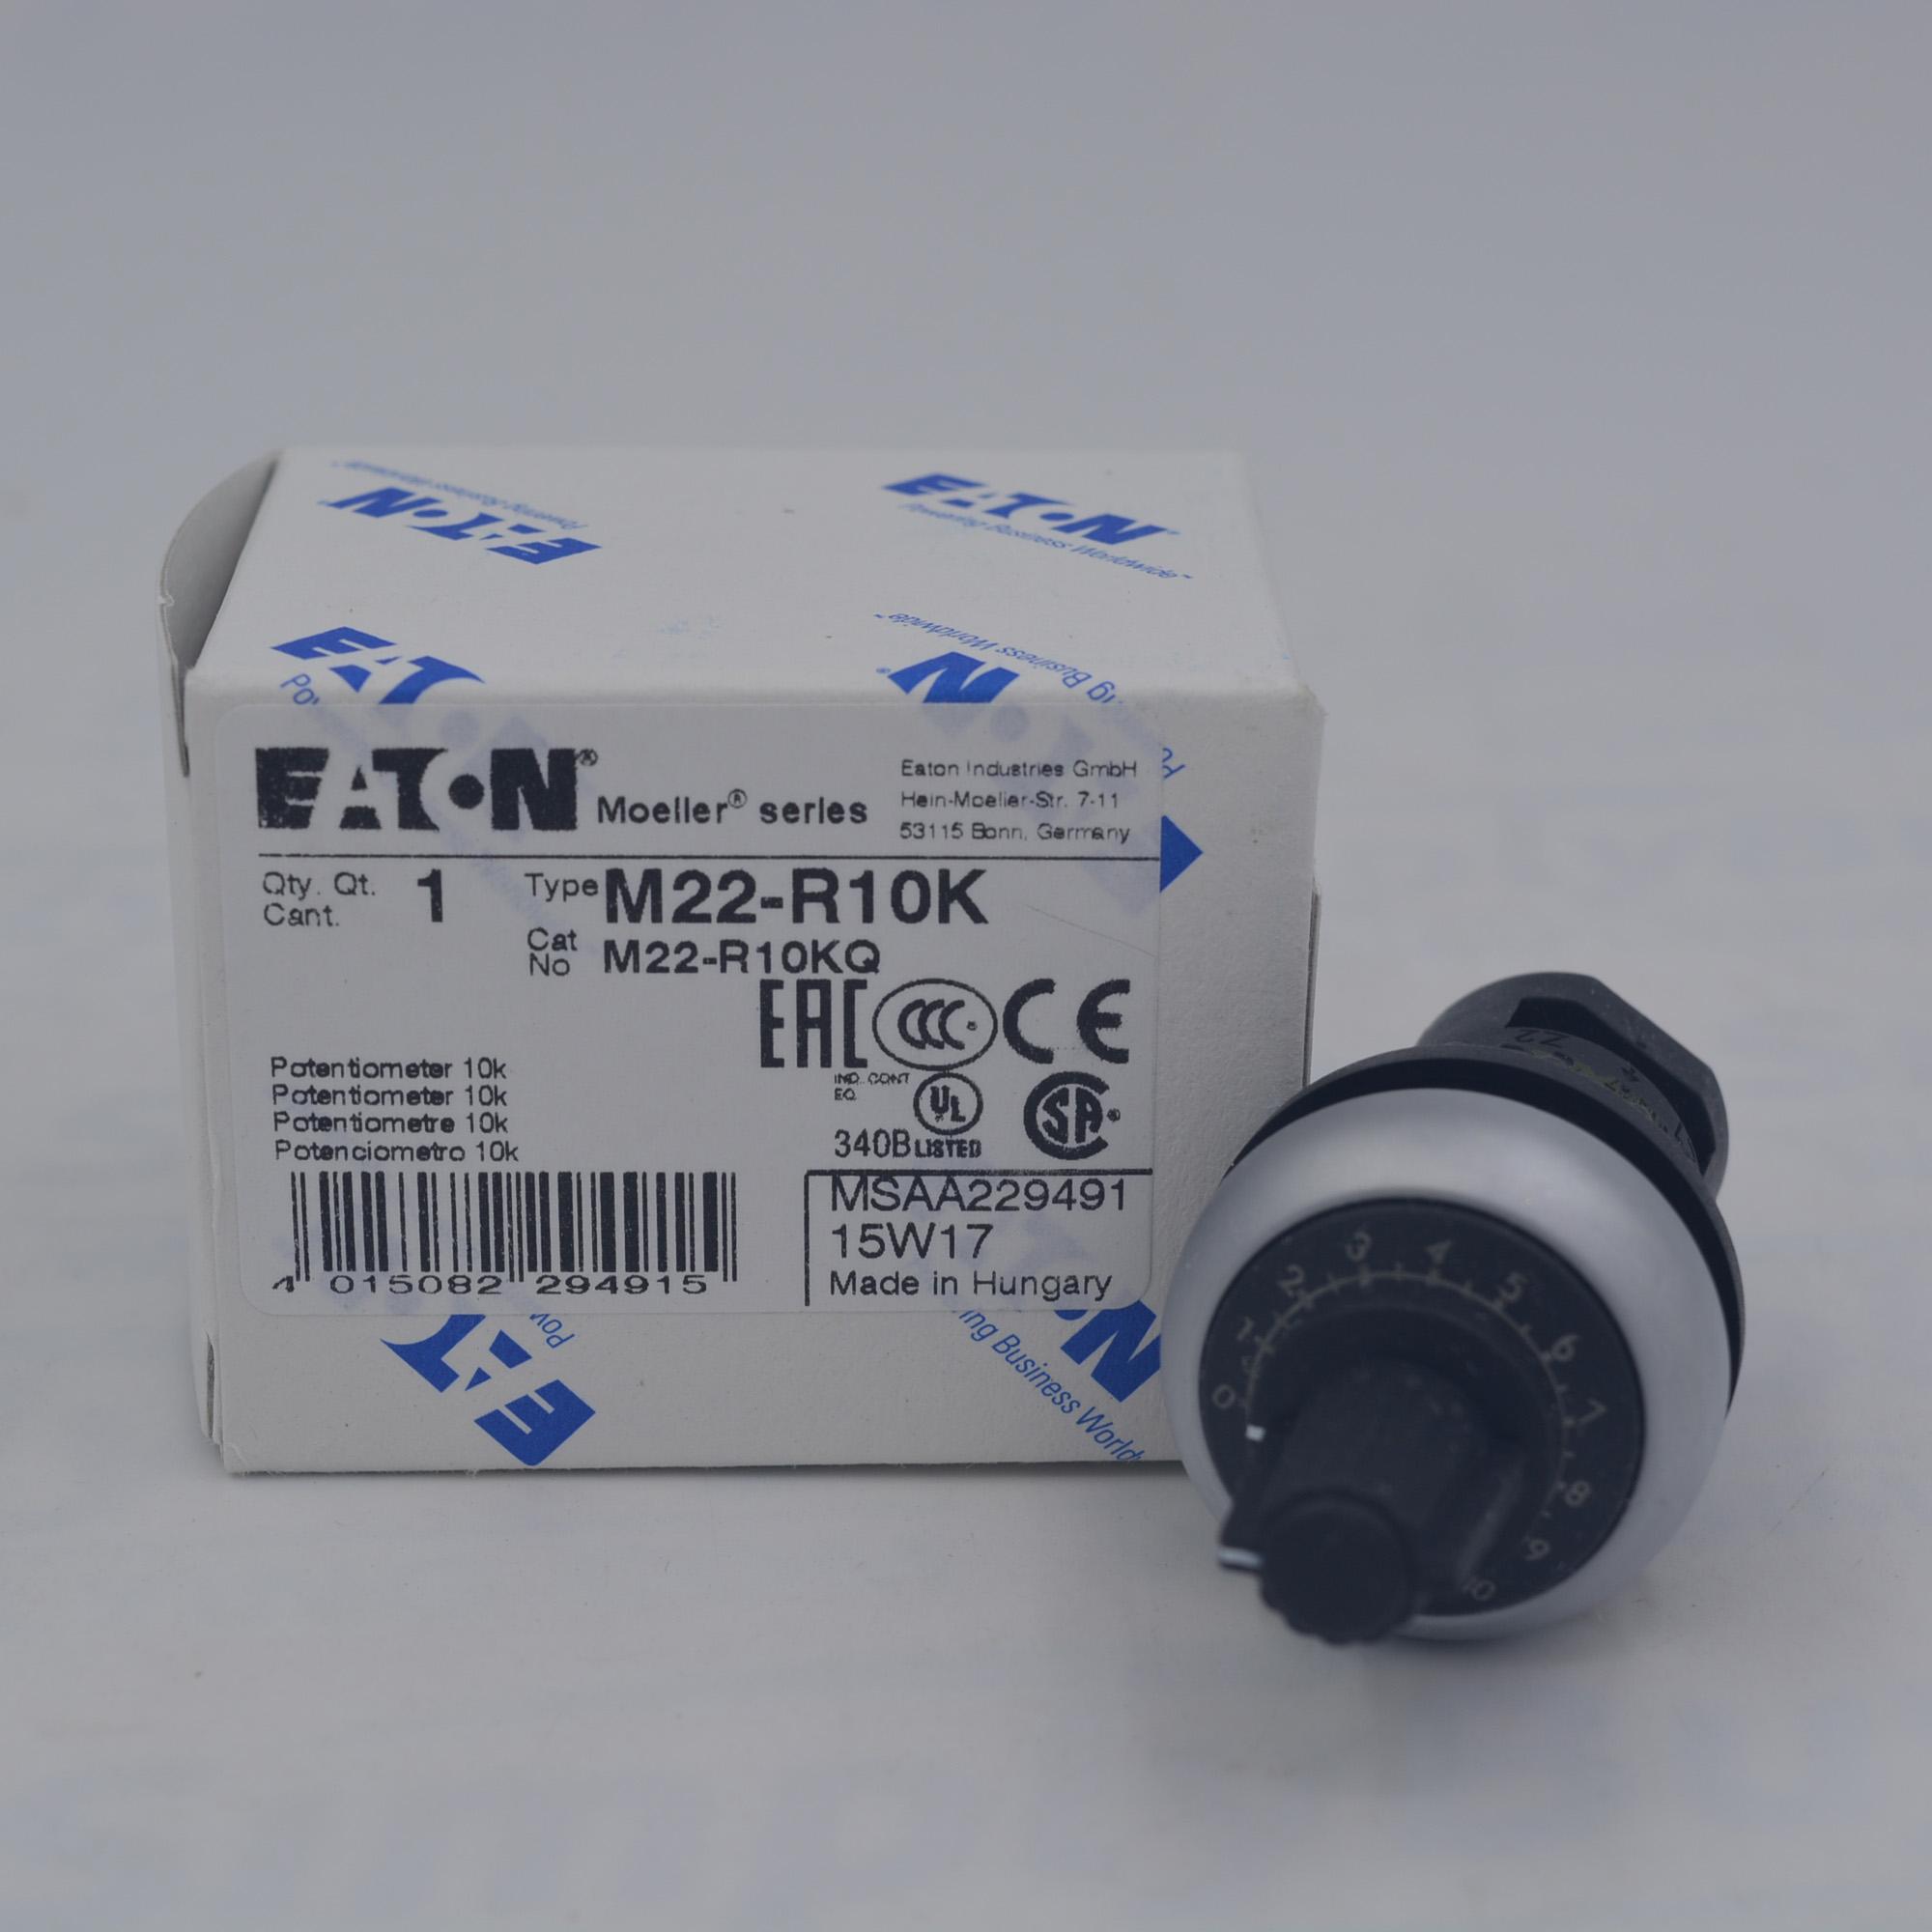 M22-R10K